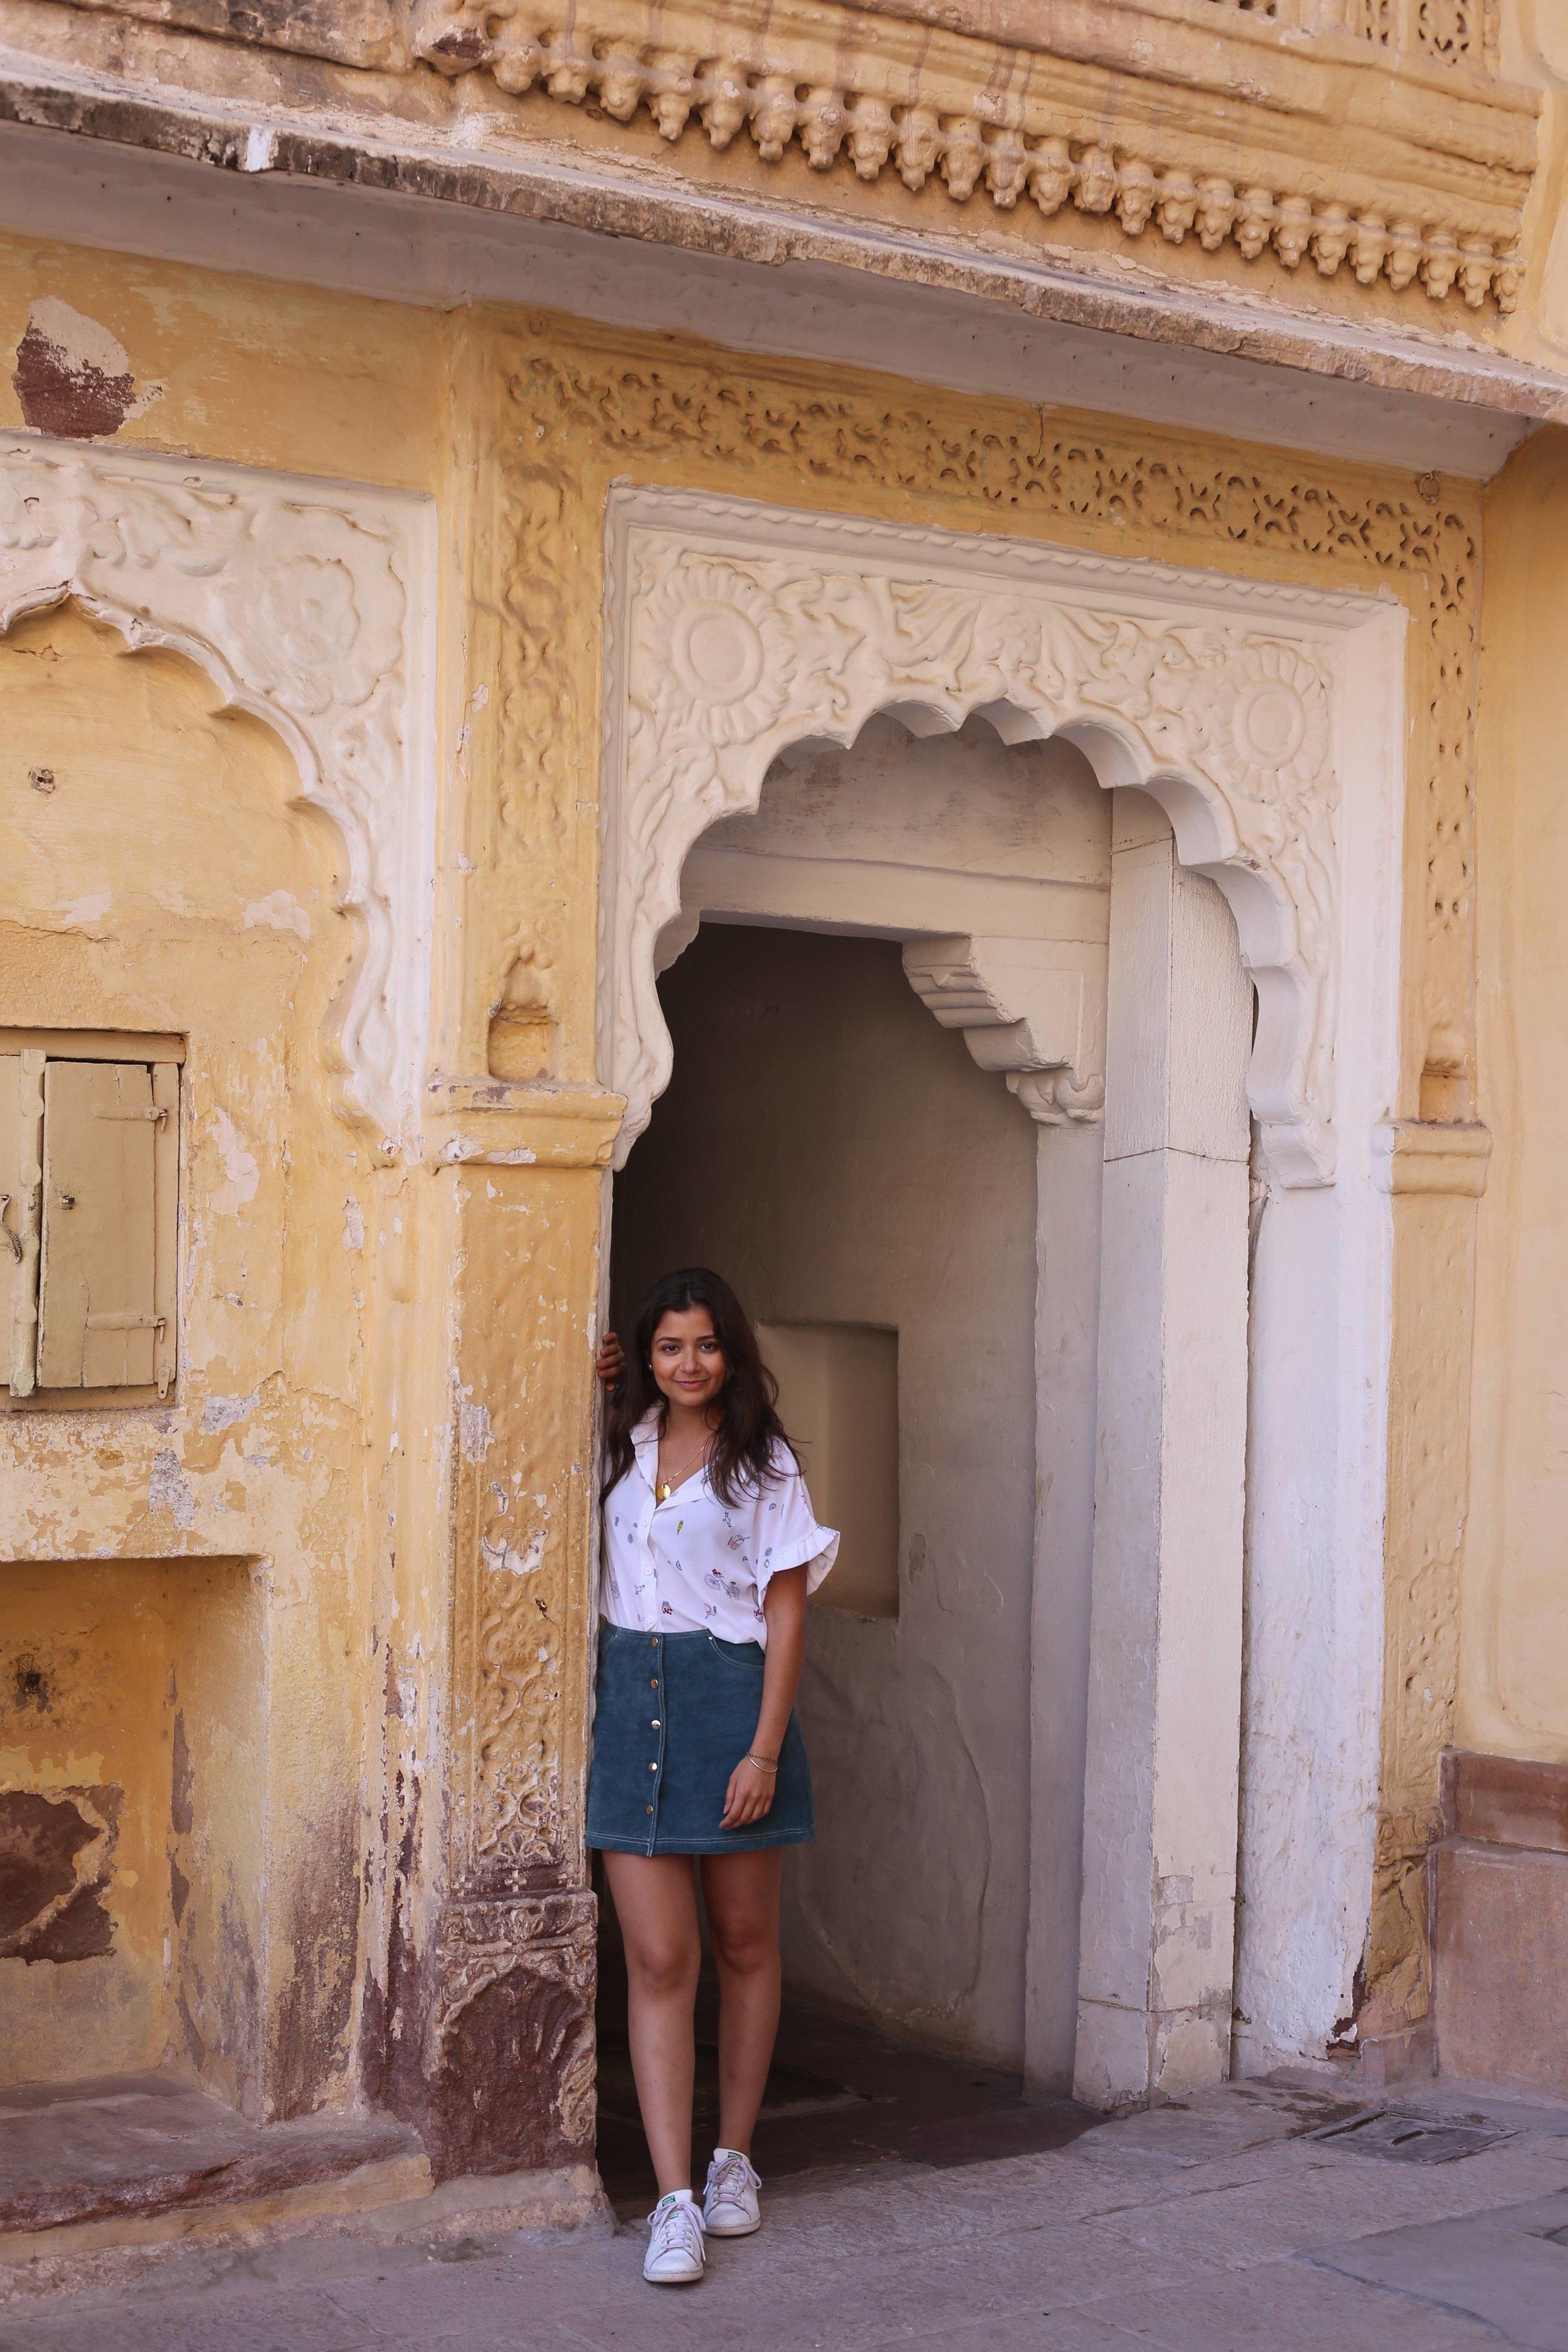 Eva Ramiriez- Voyager Voices - Guide to Rajasthan - Jaipur - Travel Journal